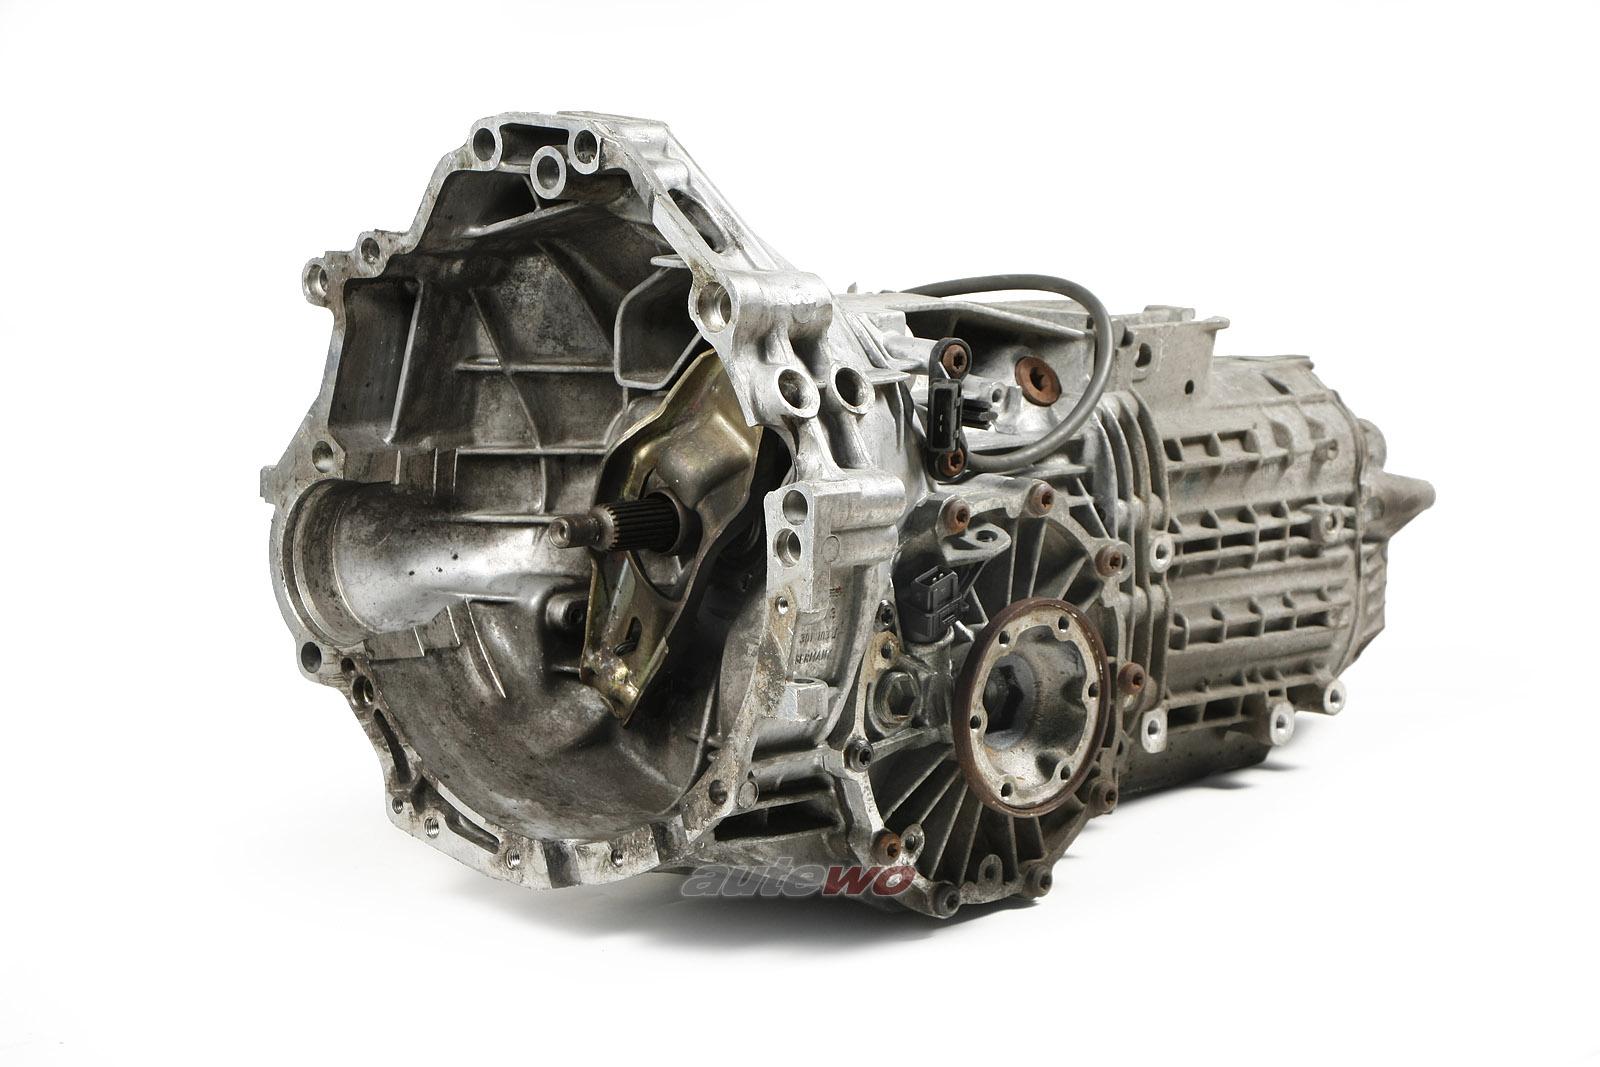 012300047KX Audi 80 B4 2.0l Getriebe 5-Gang CGT 27072